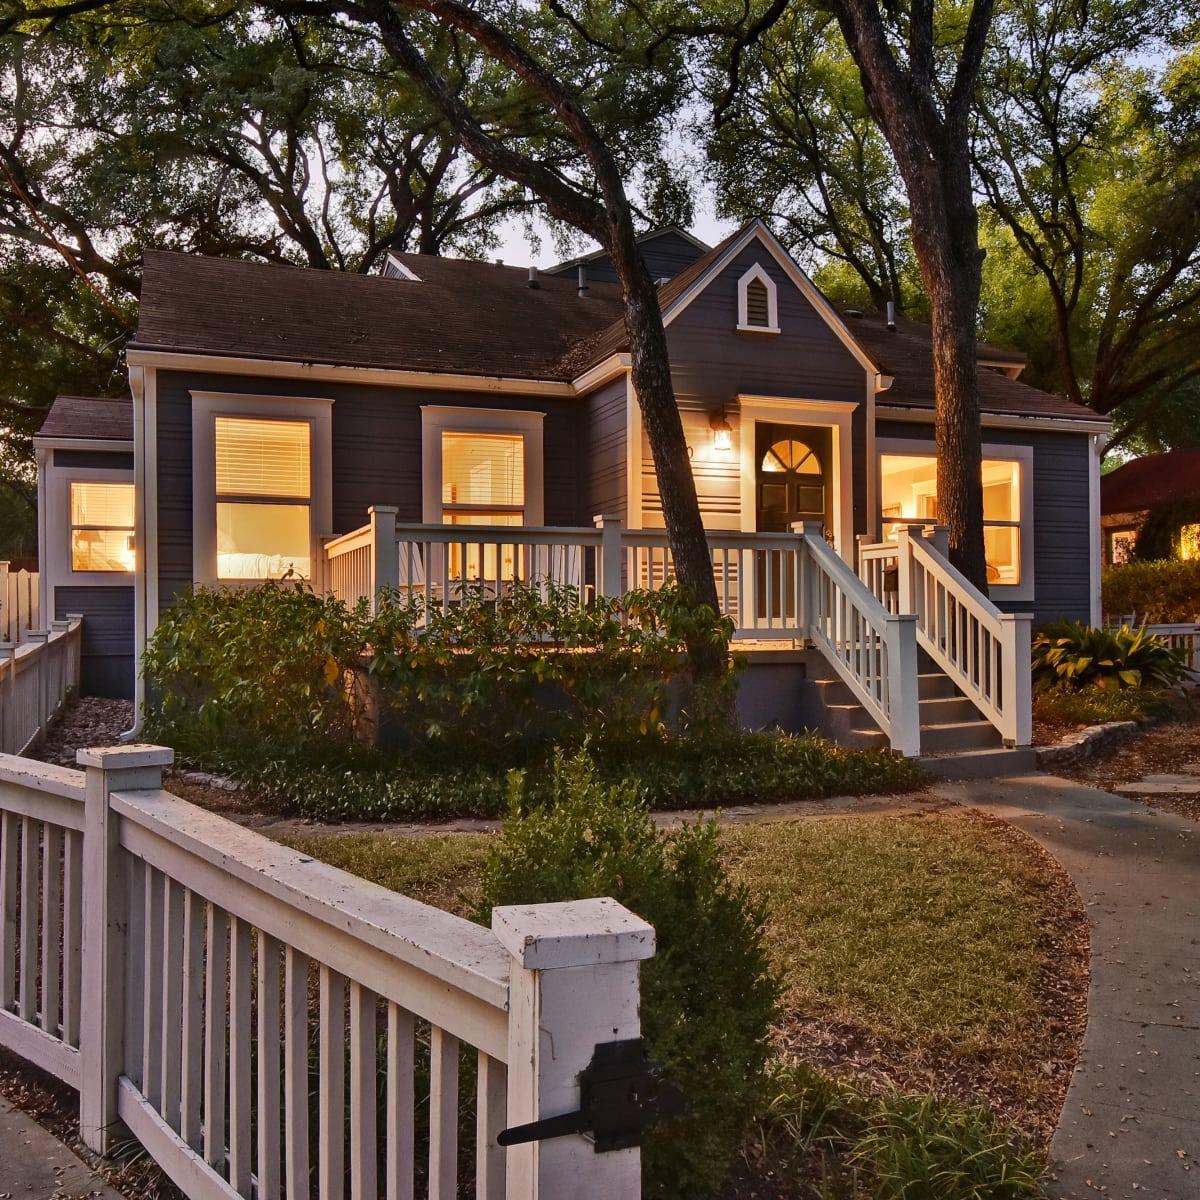 West Austin home house 2200 Sharon Lane exterior front driveway